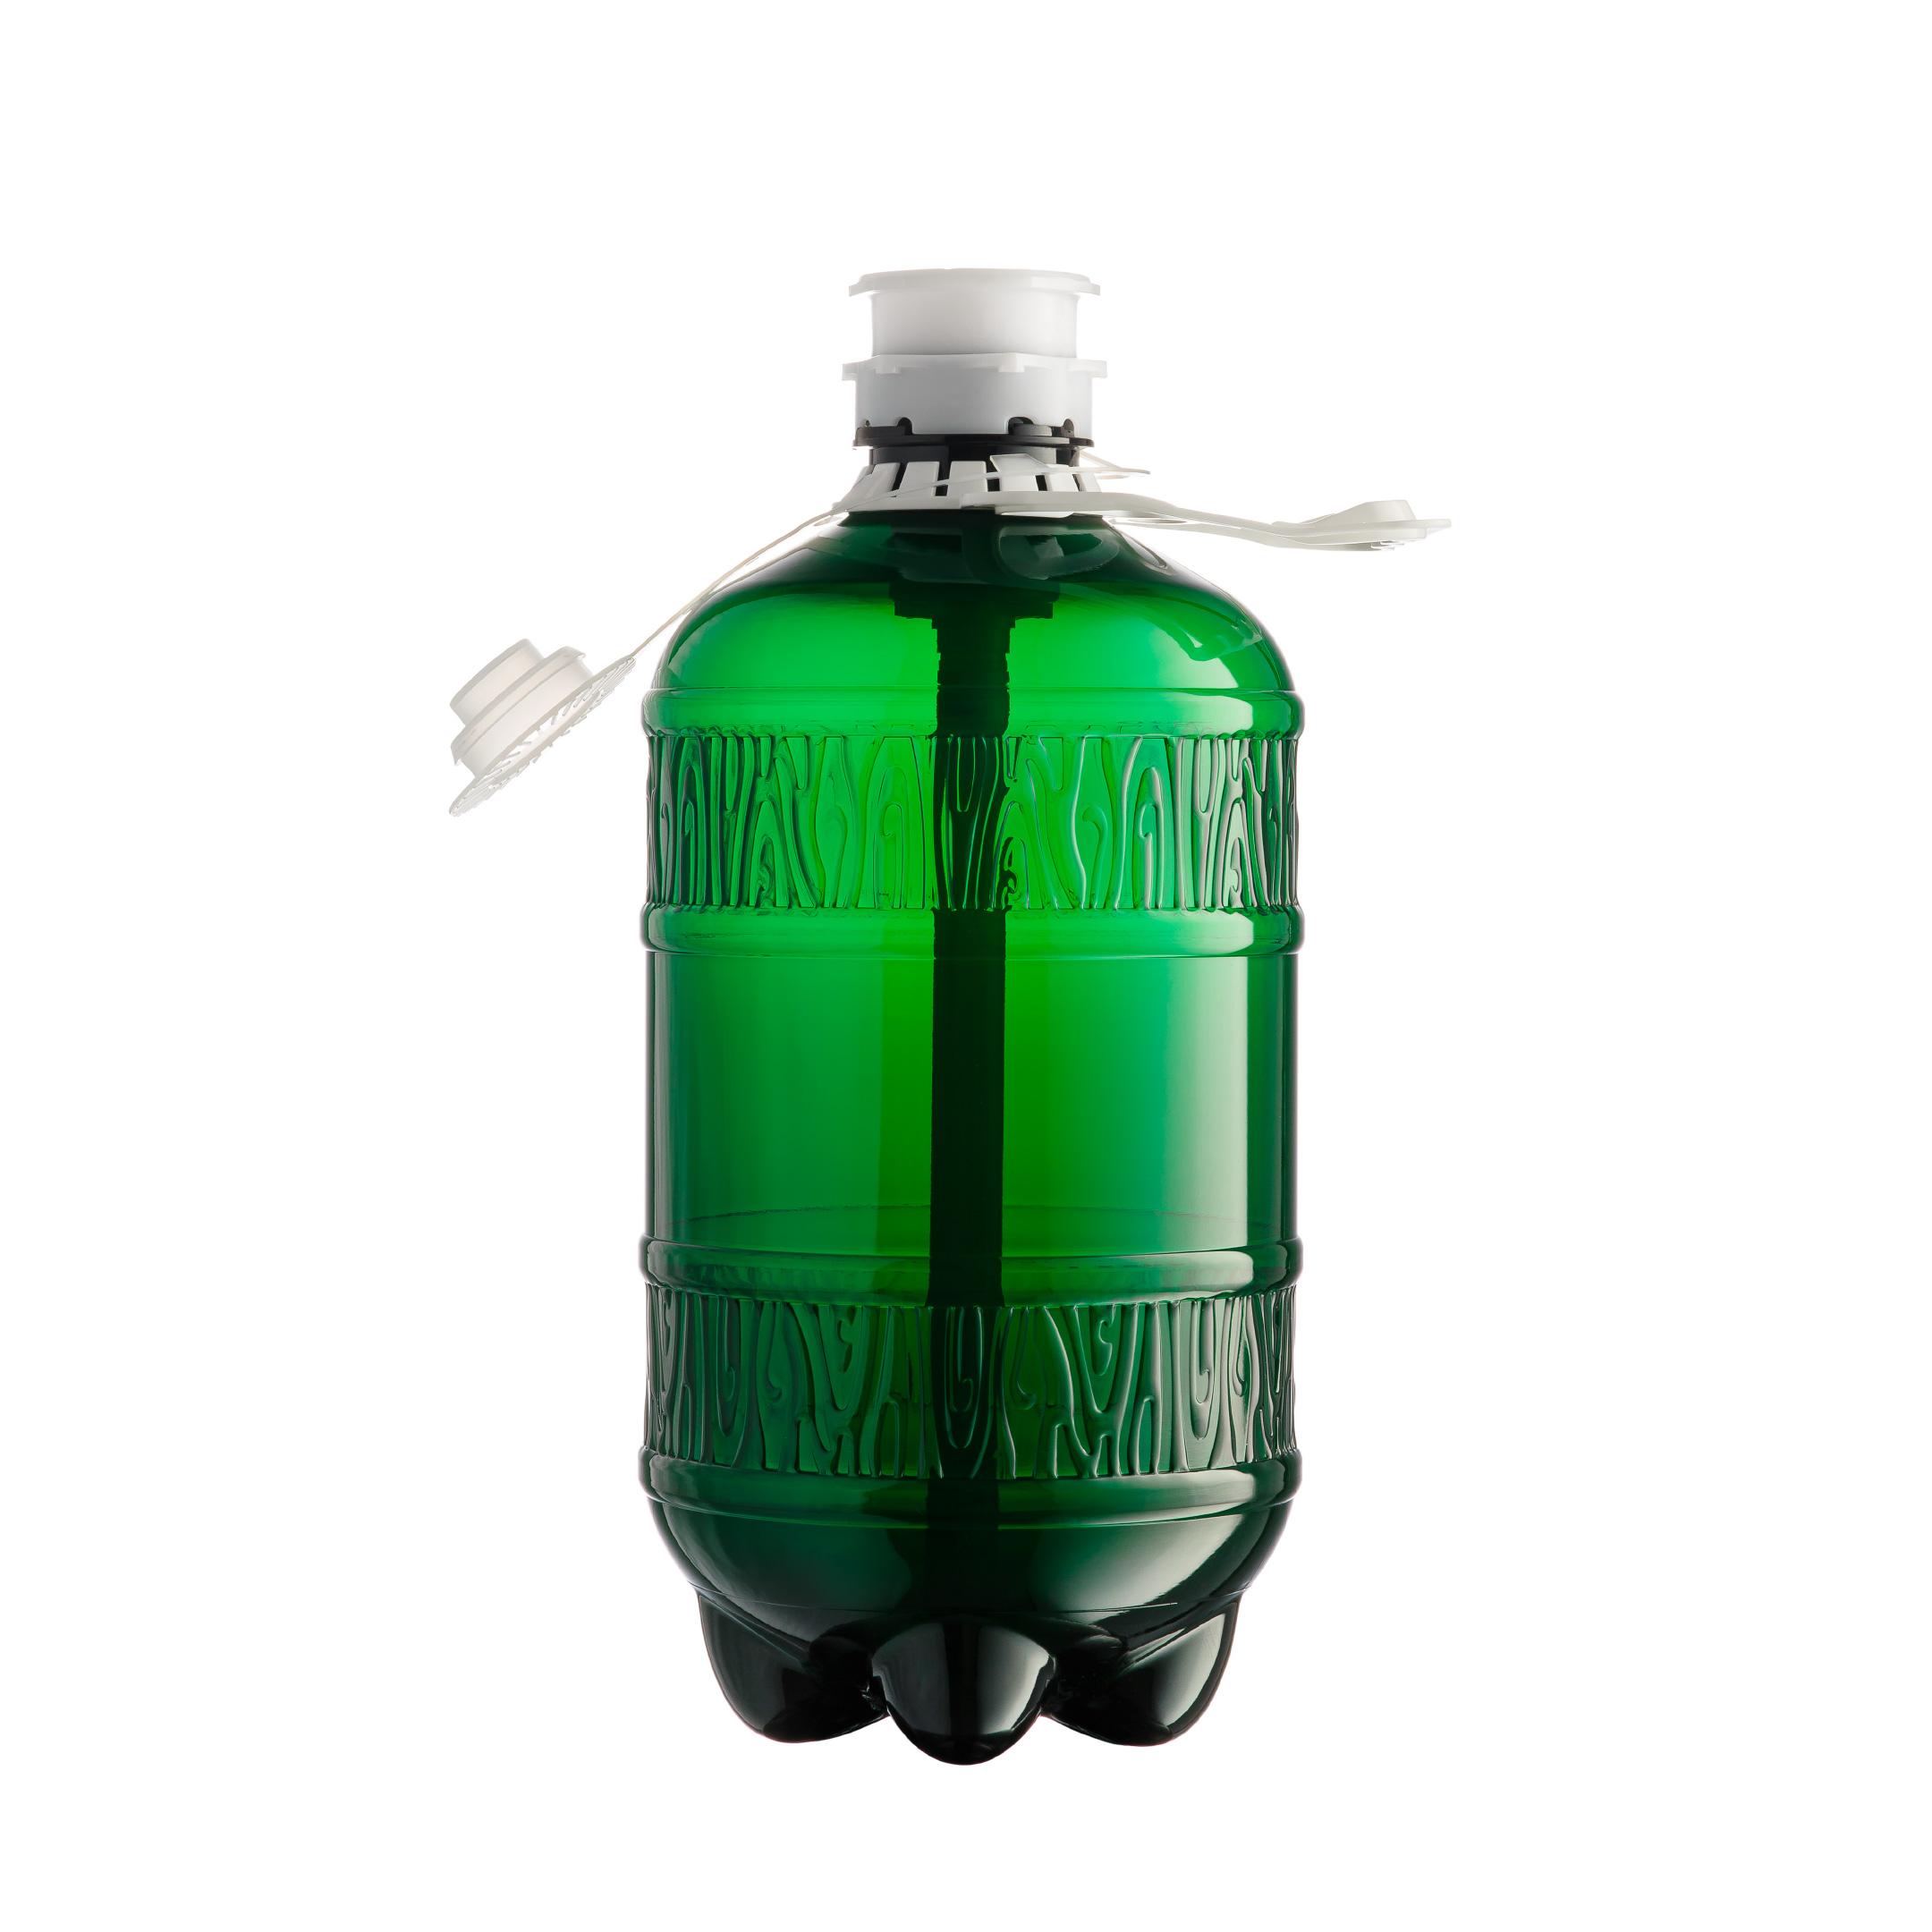 keg plastico, barril plastico